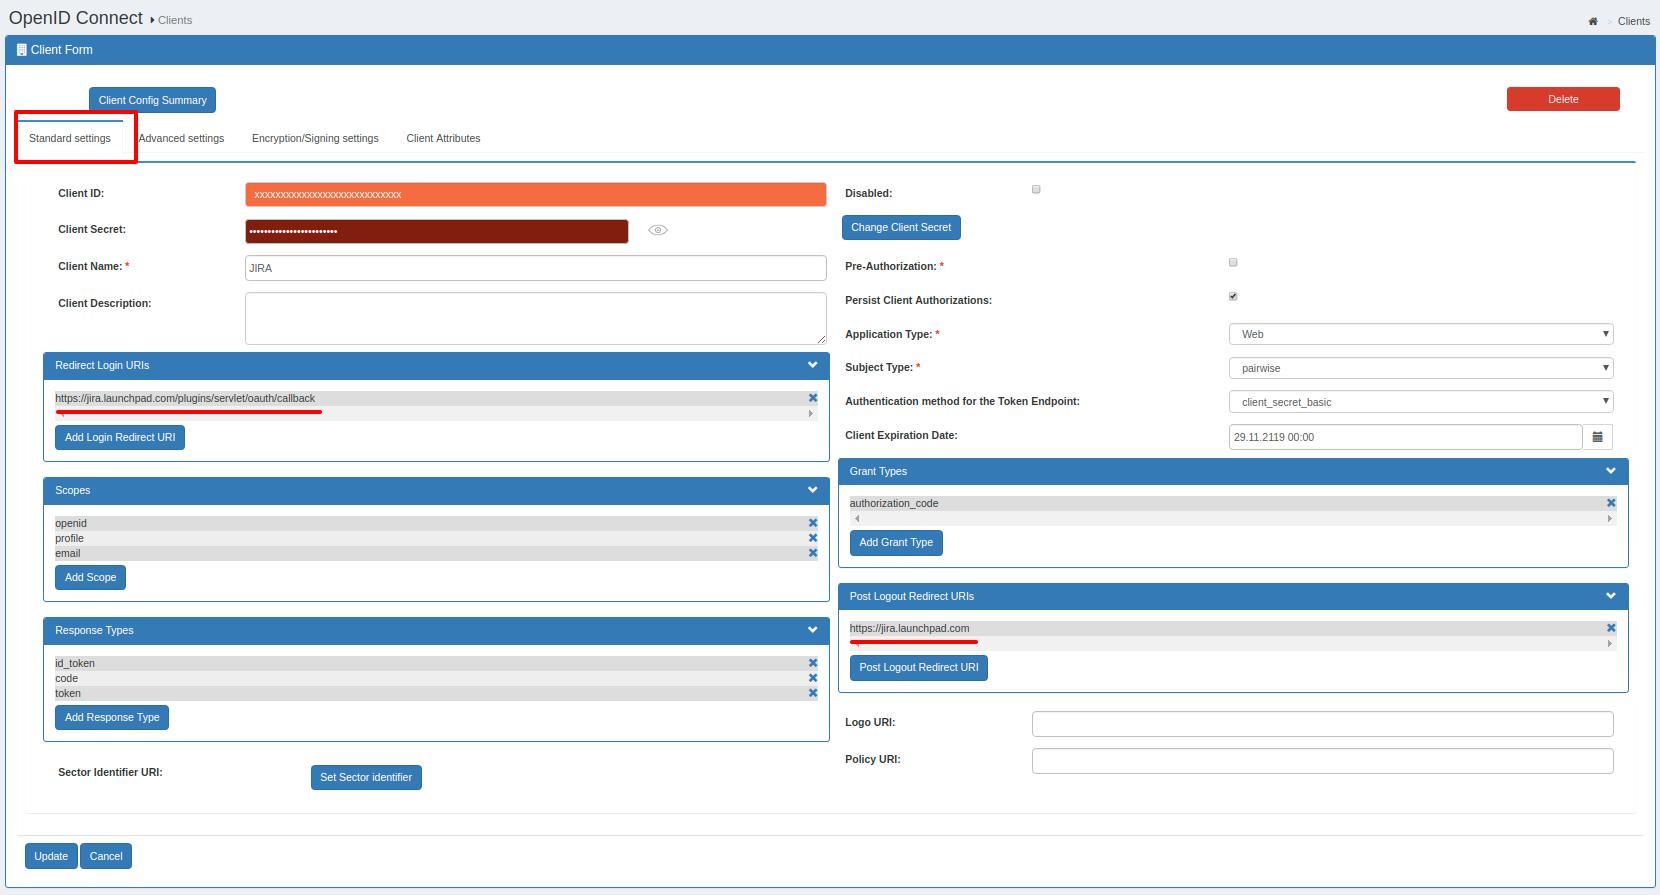 OAuth/OpenID/OIDC Single Sign On (SSO), Gluu Server SSO Login App Settings